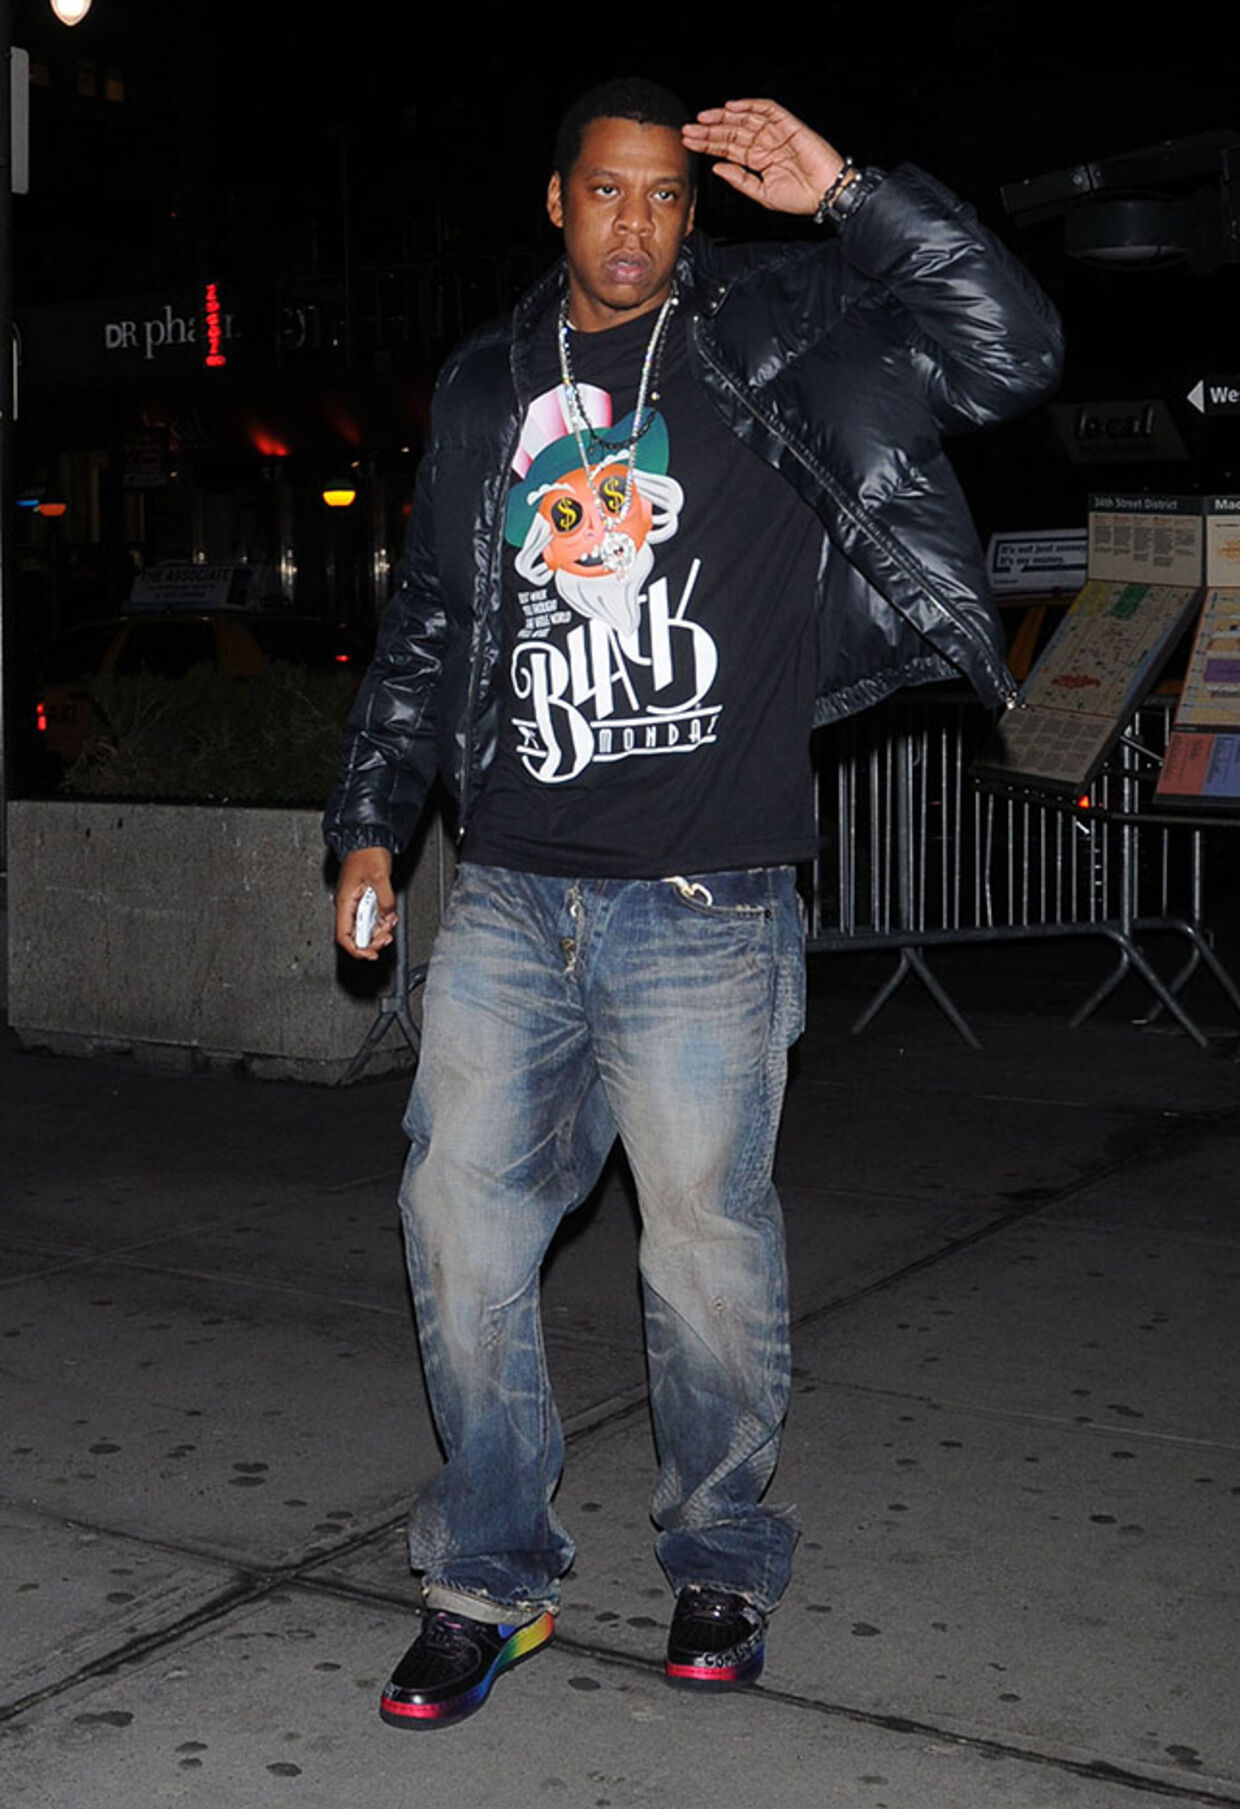 En yngre Jay Z i hiphop-uniformen.